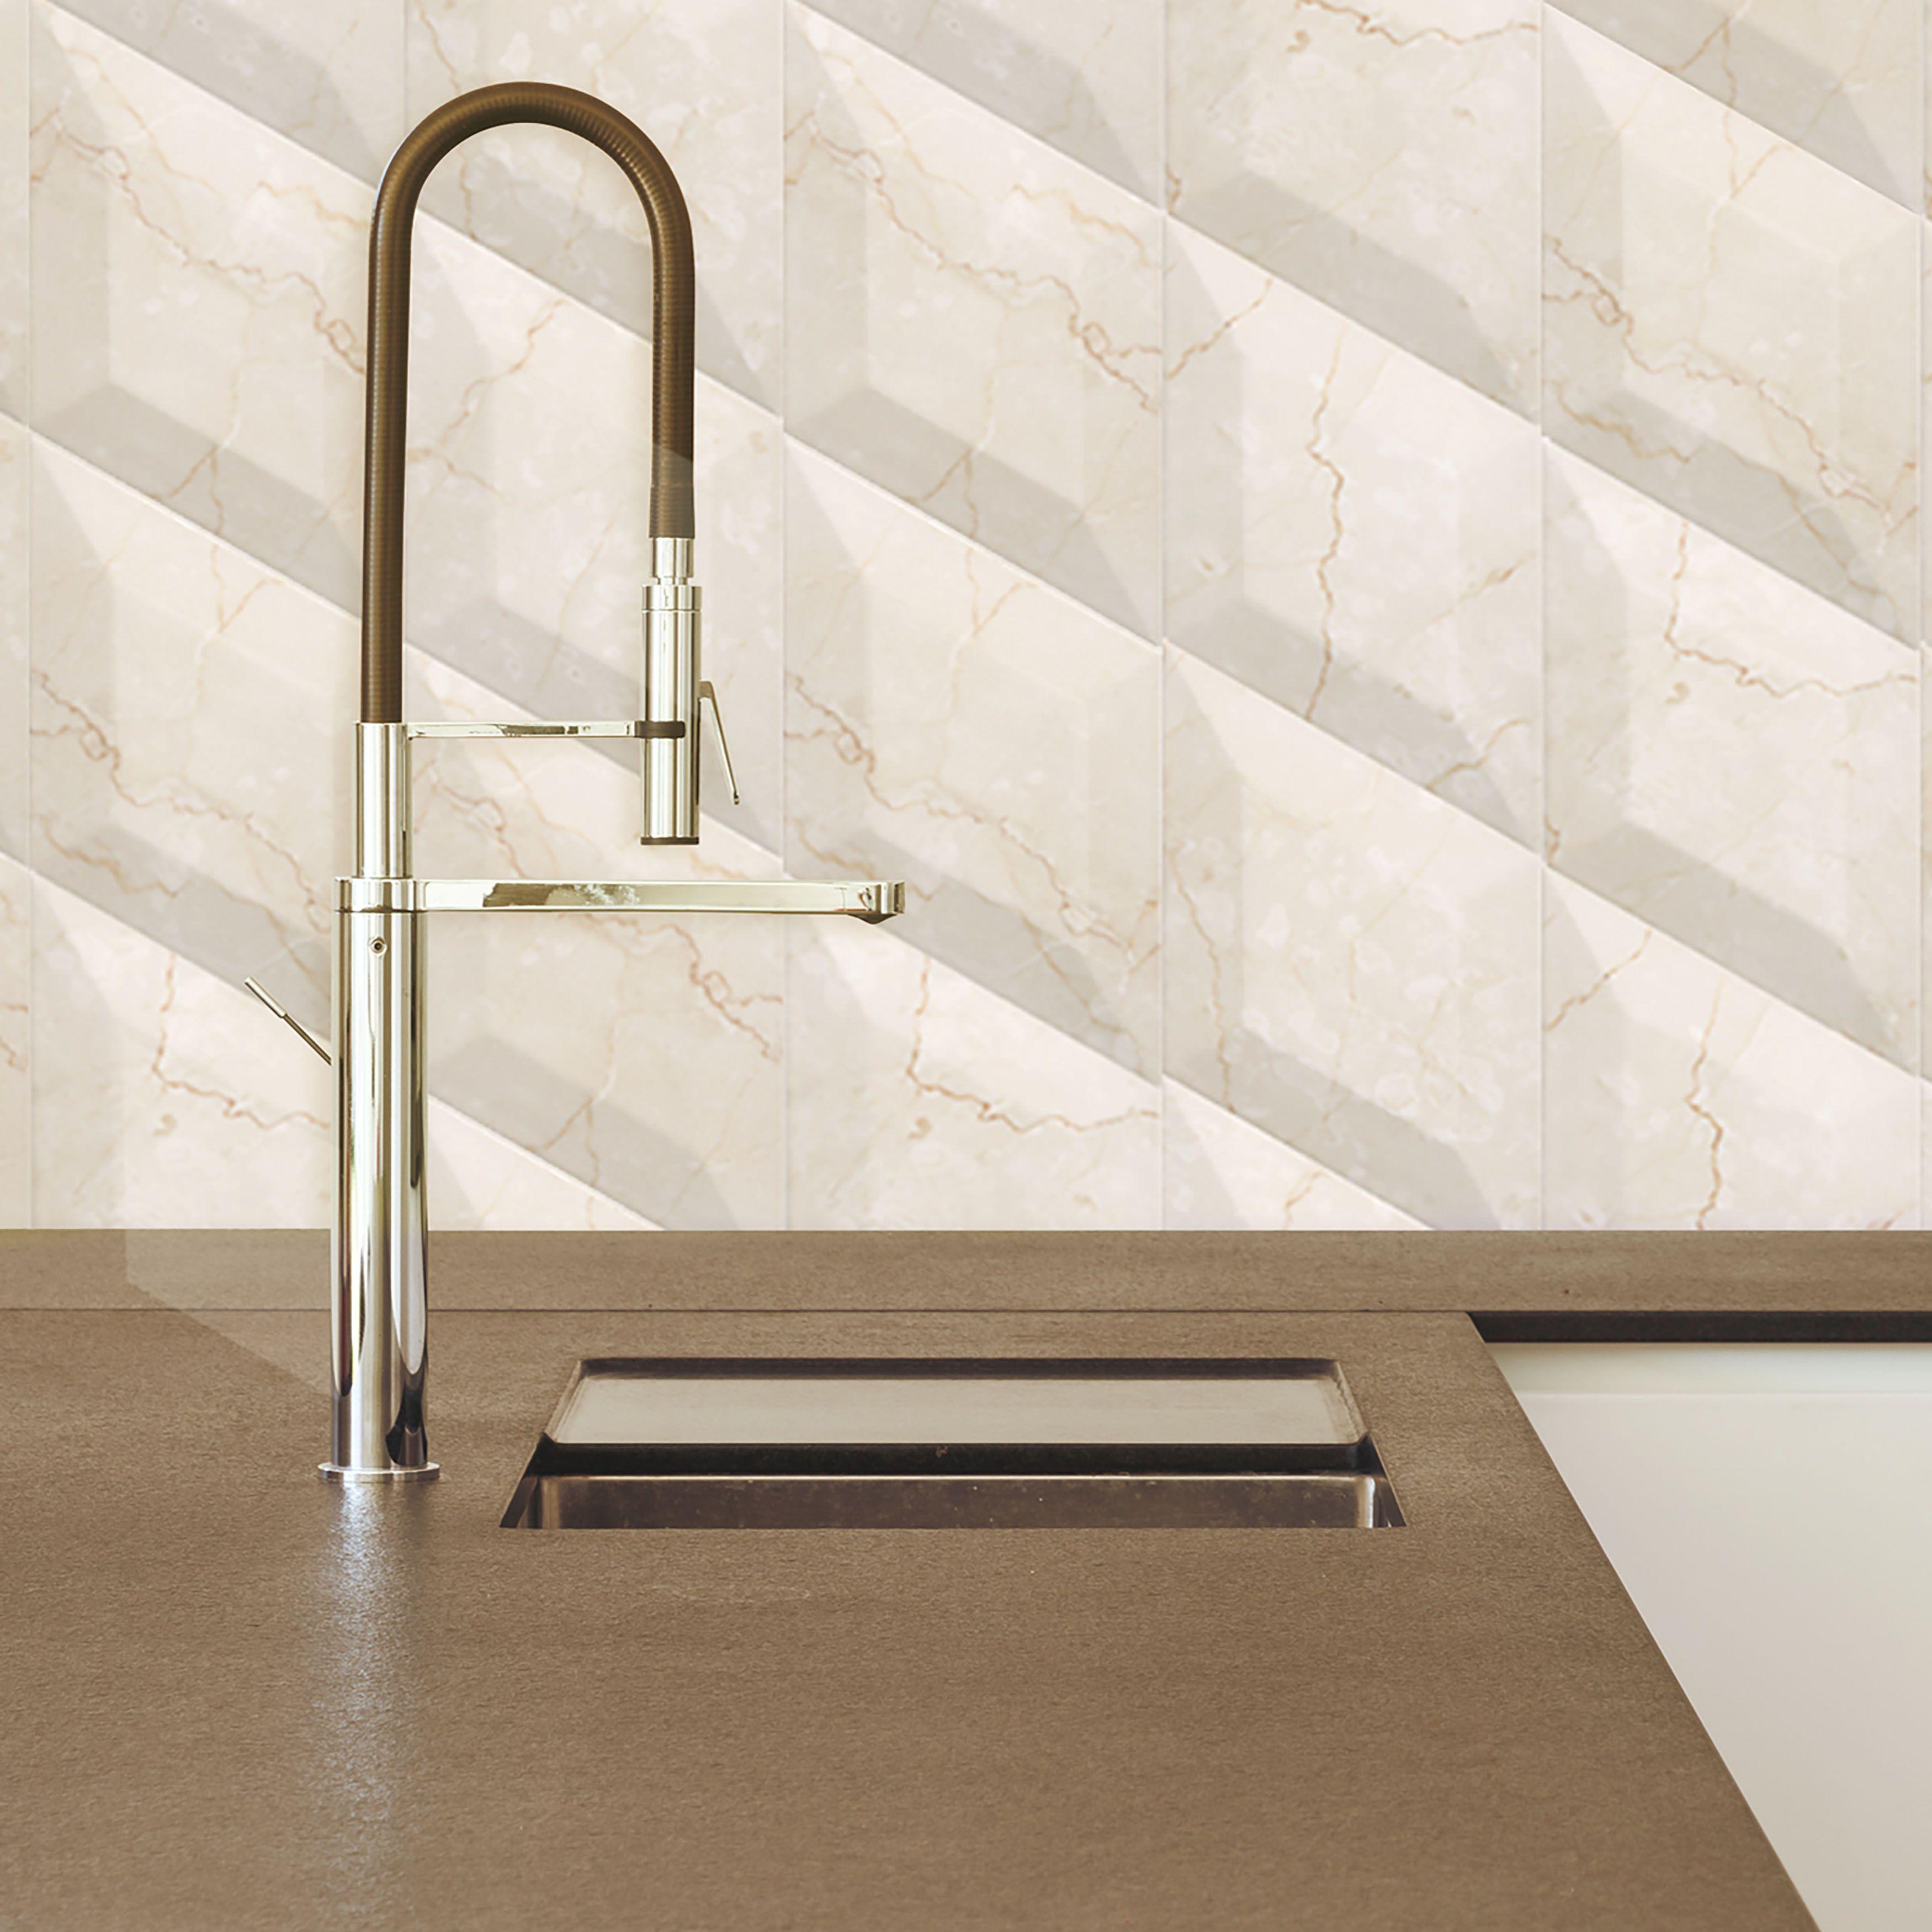 SomerTile 6.75x11.75-inch Aratiba Bevel Beige Ceramic Wall Tile ...